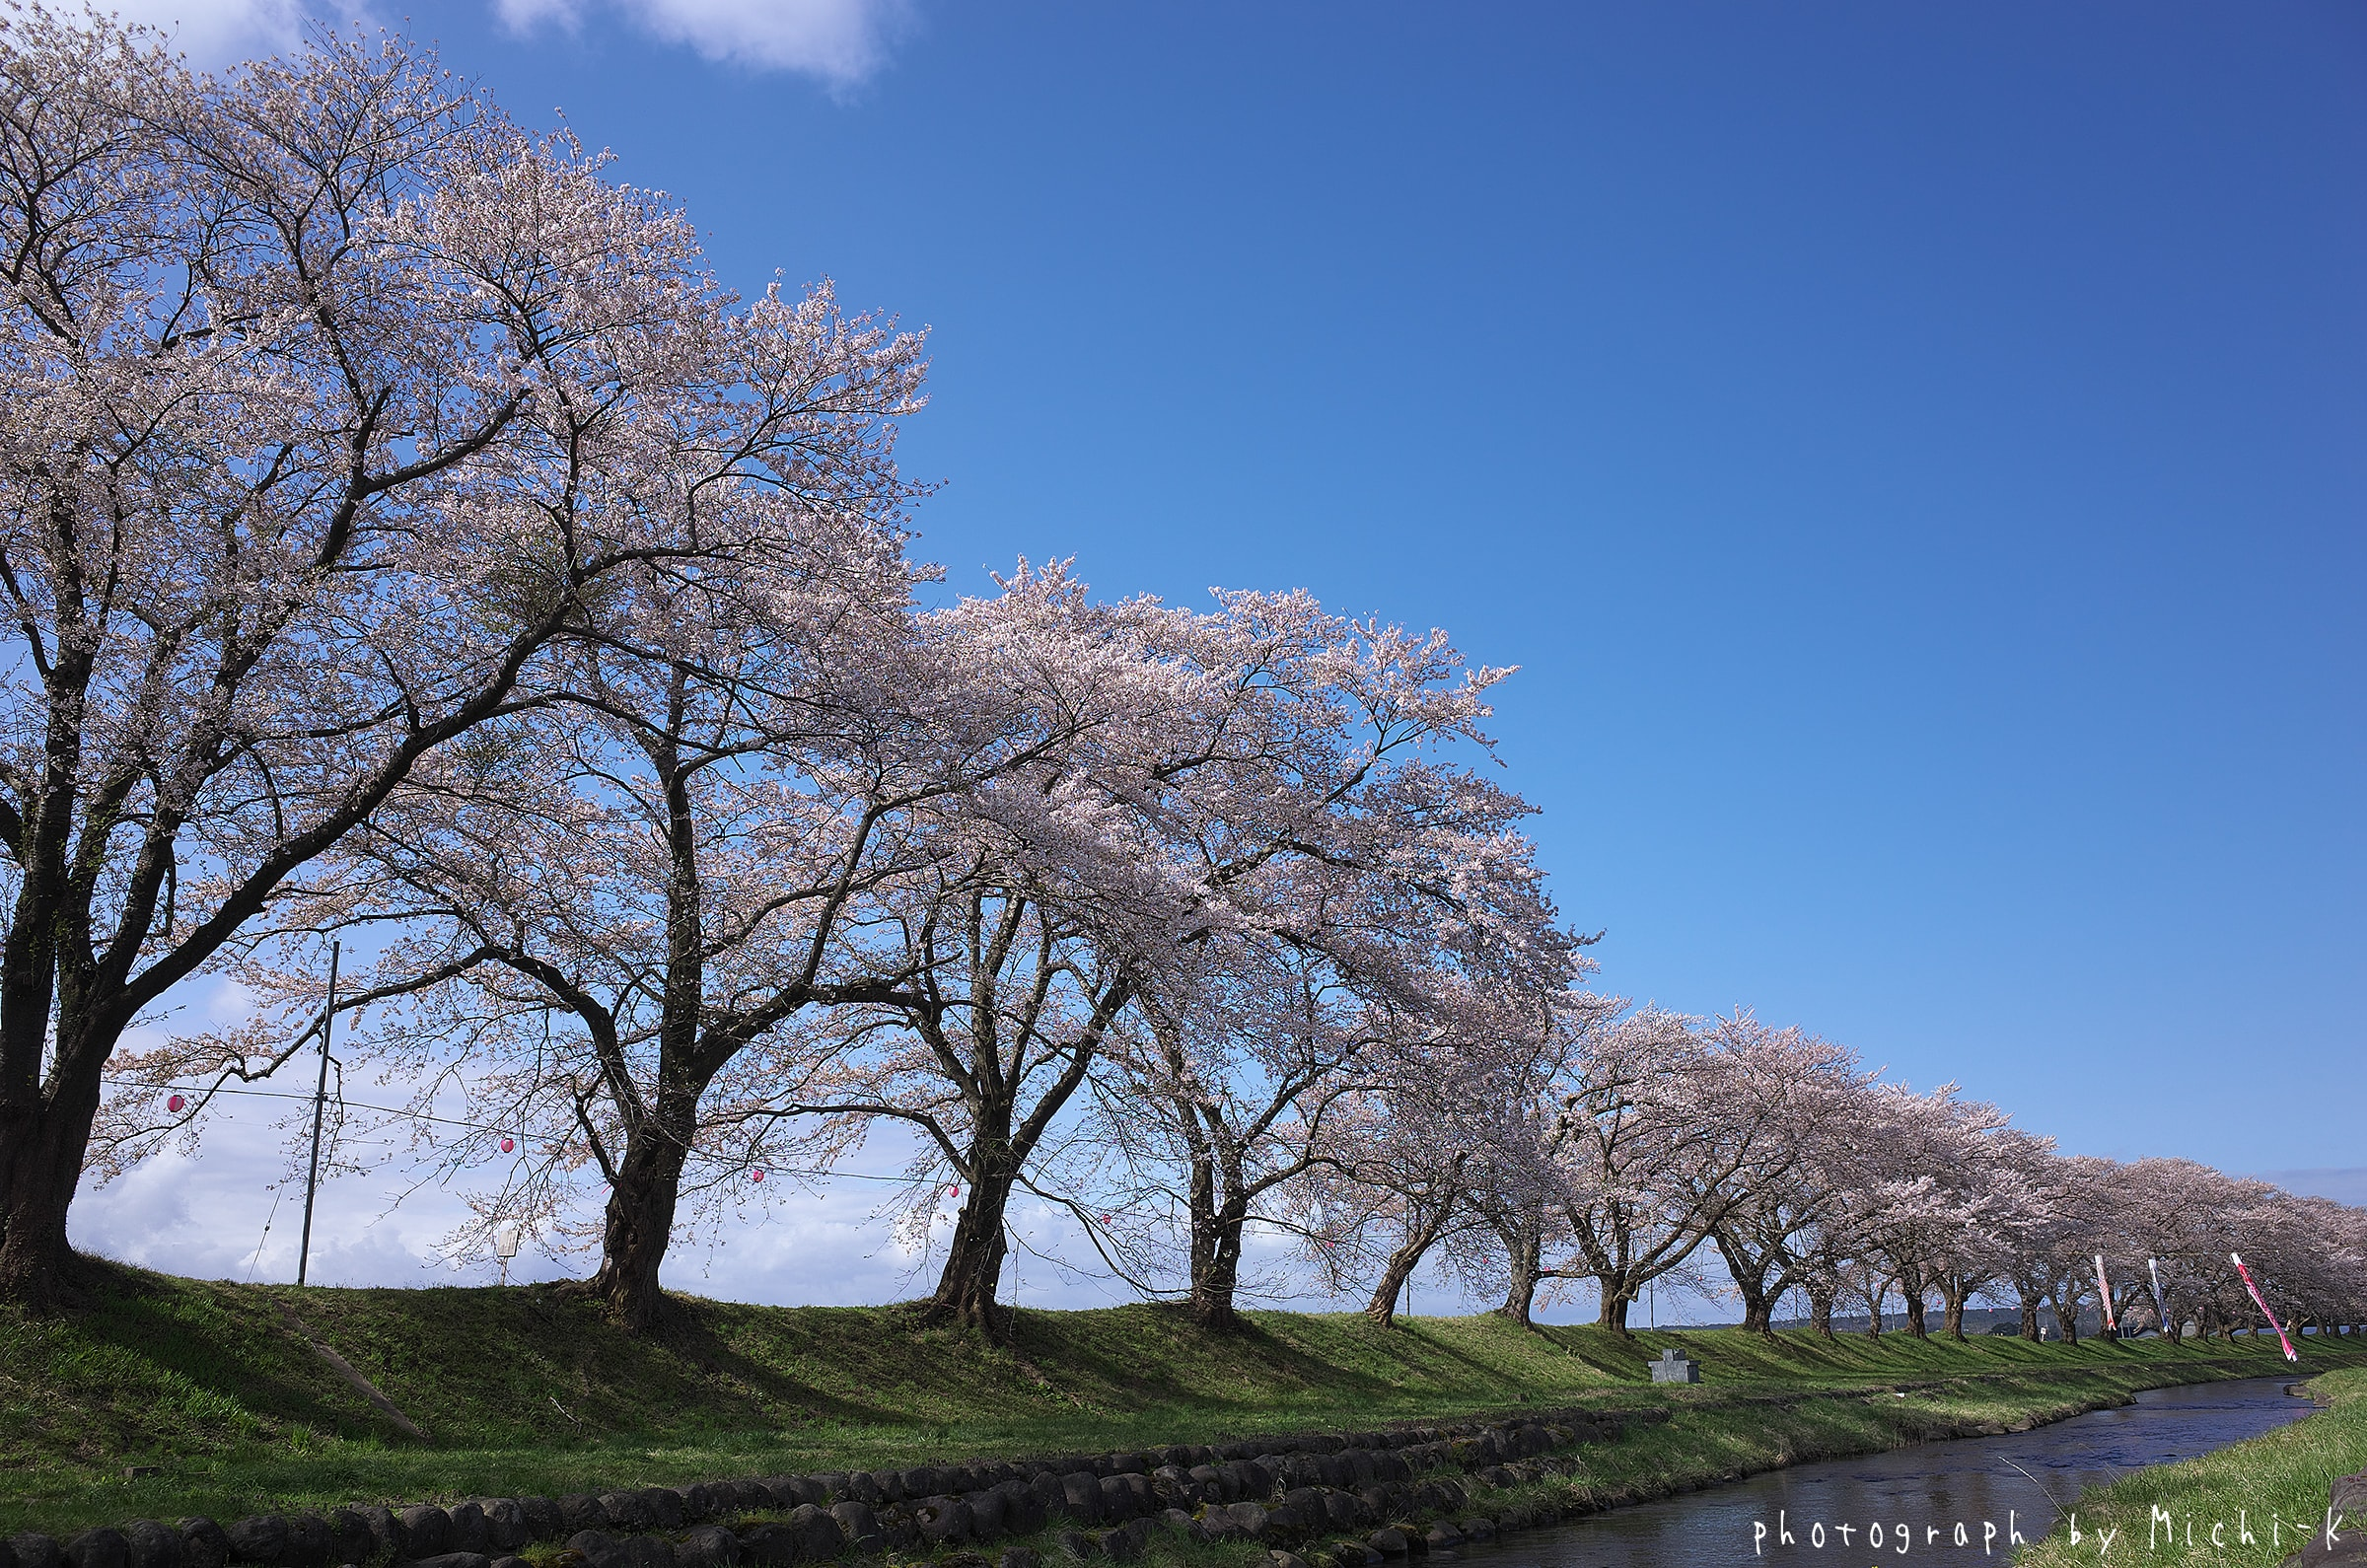 2017山形県遊佐町、中山河川公園の桜No.1